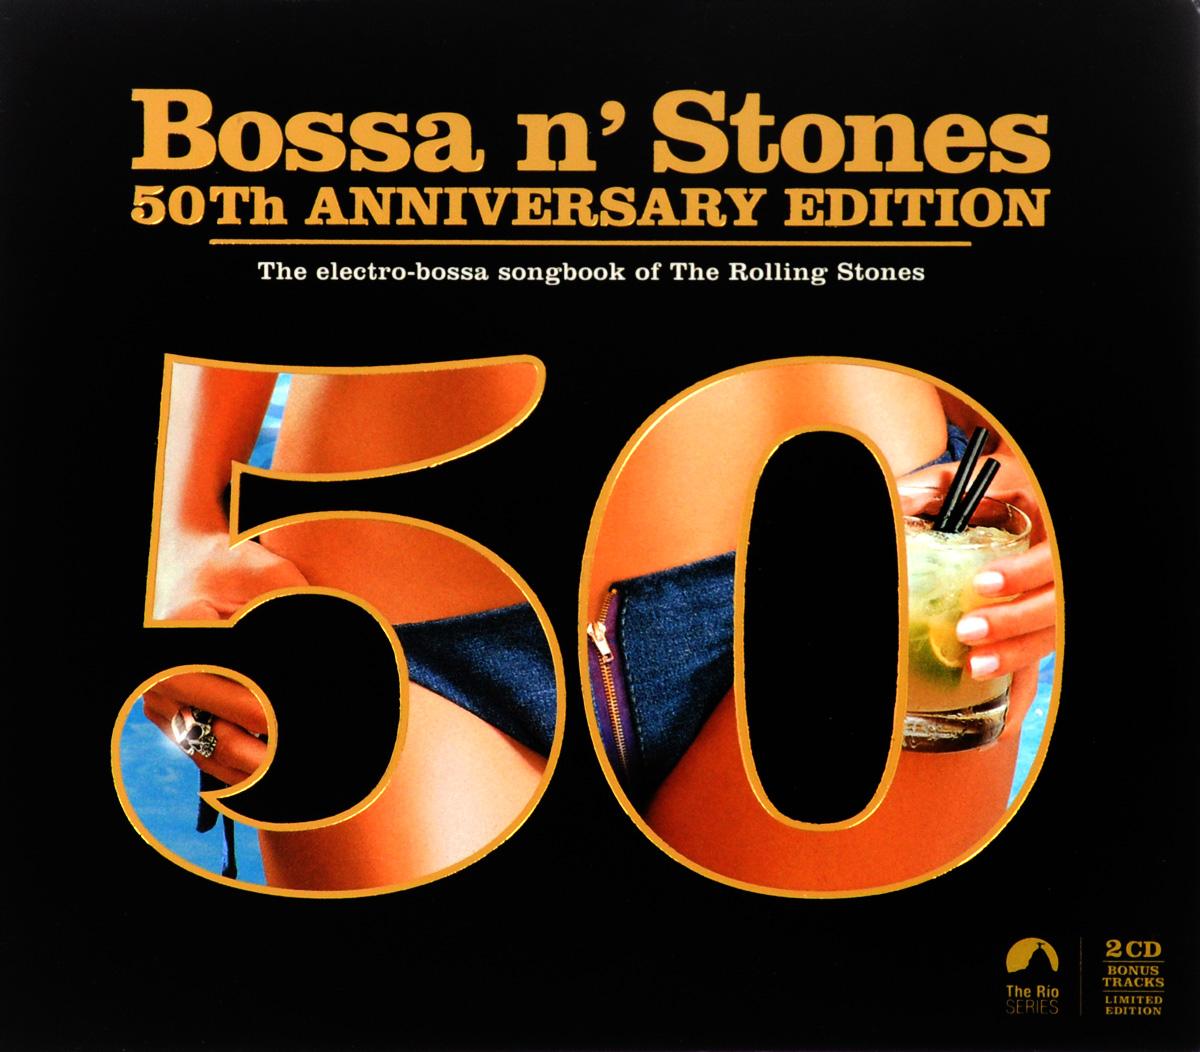 Bossa n' Stones 50th Anniversary Edition (2 CD) secret of the stones cd new edition